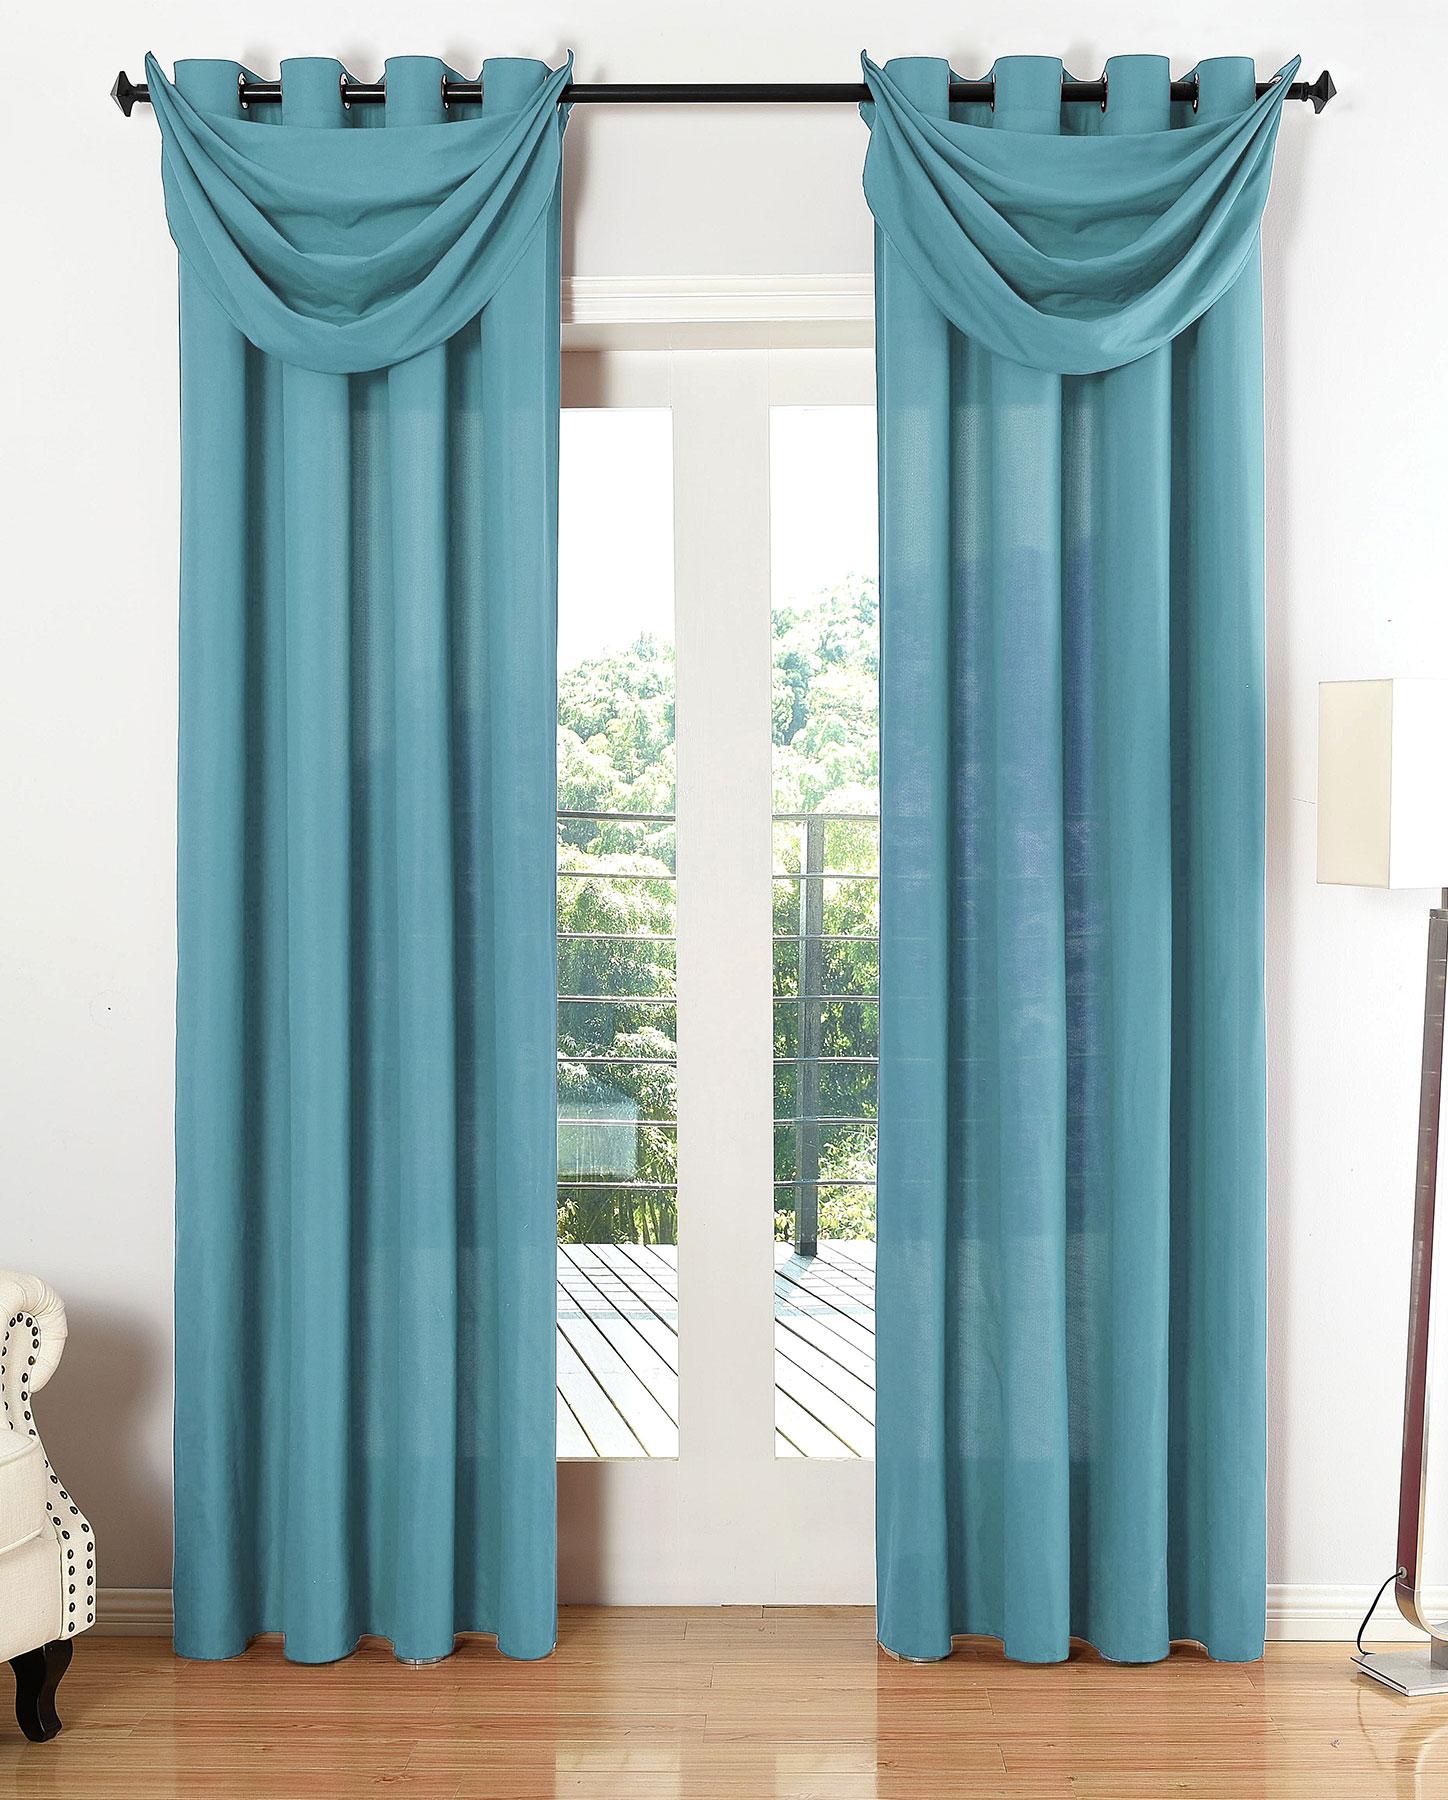 vorhang set 6 teilig blickdicht schal gardine sen microsatin segel querbehang ebay. Black Bedroom Furniture Sets. Home Design Ideas